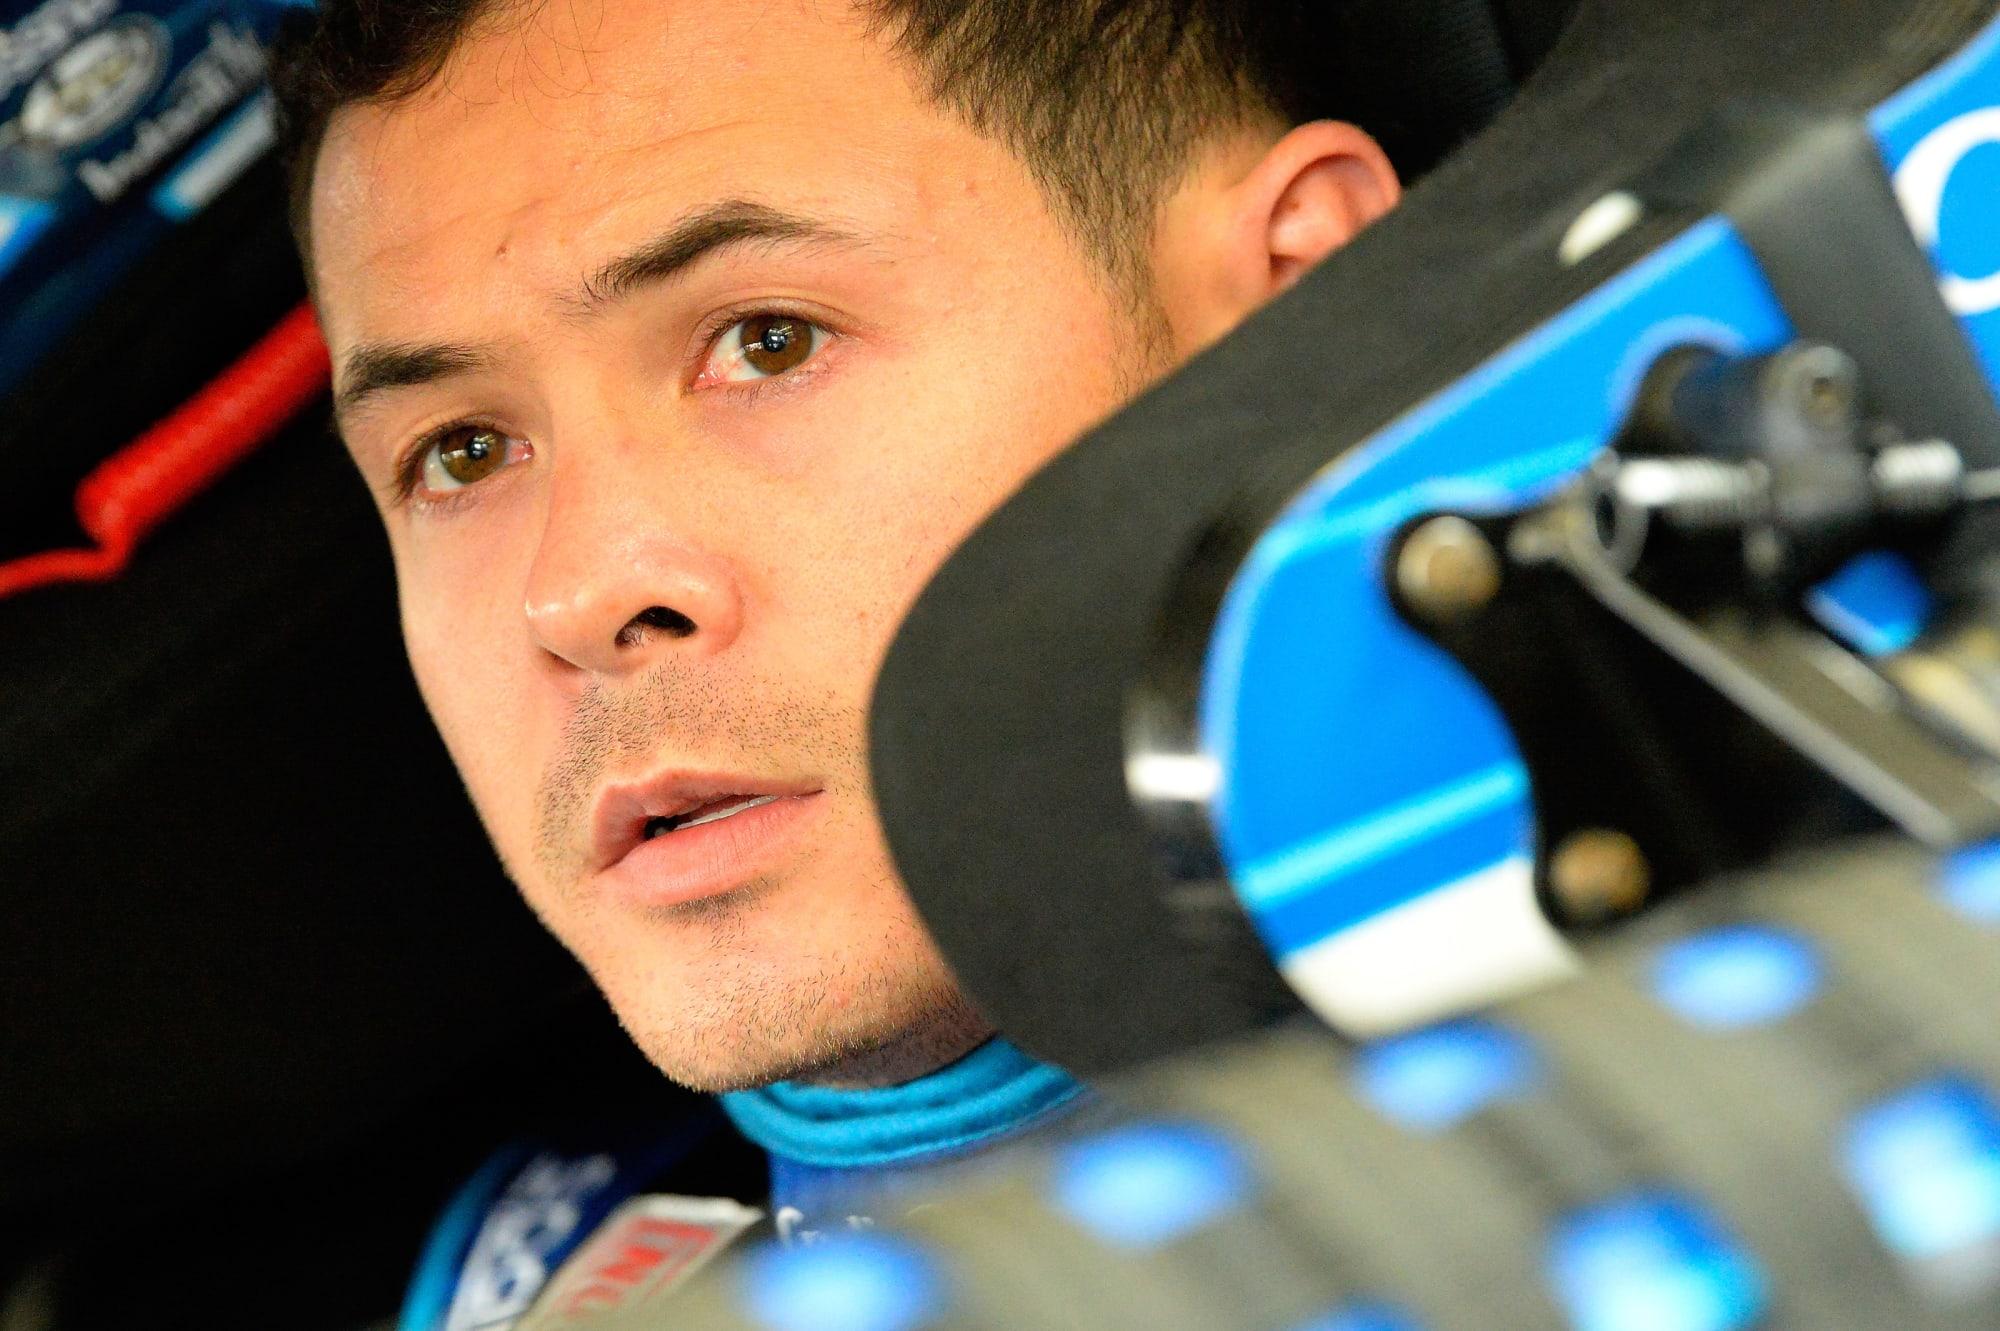 Kyle Larson wins first race since NASCAR suspension, firing